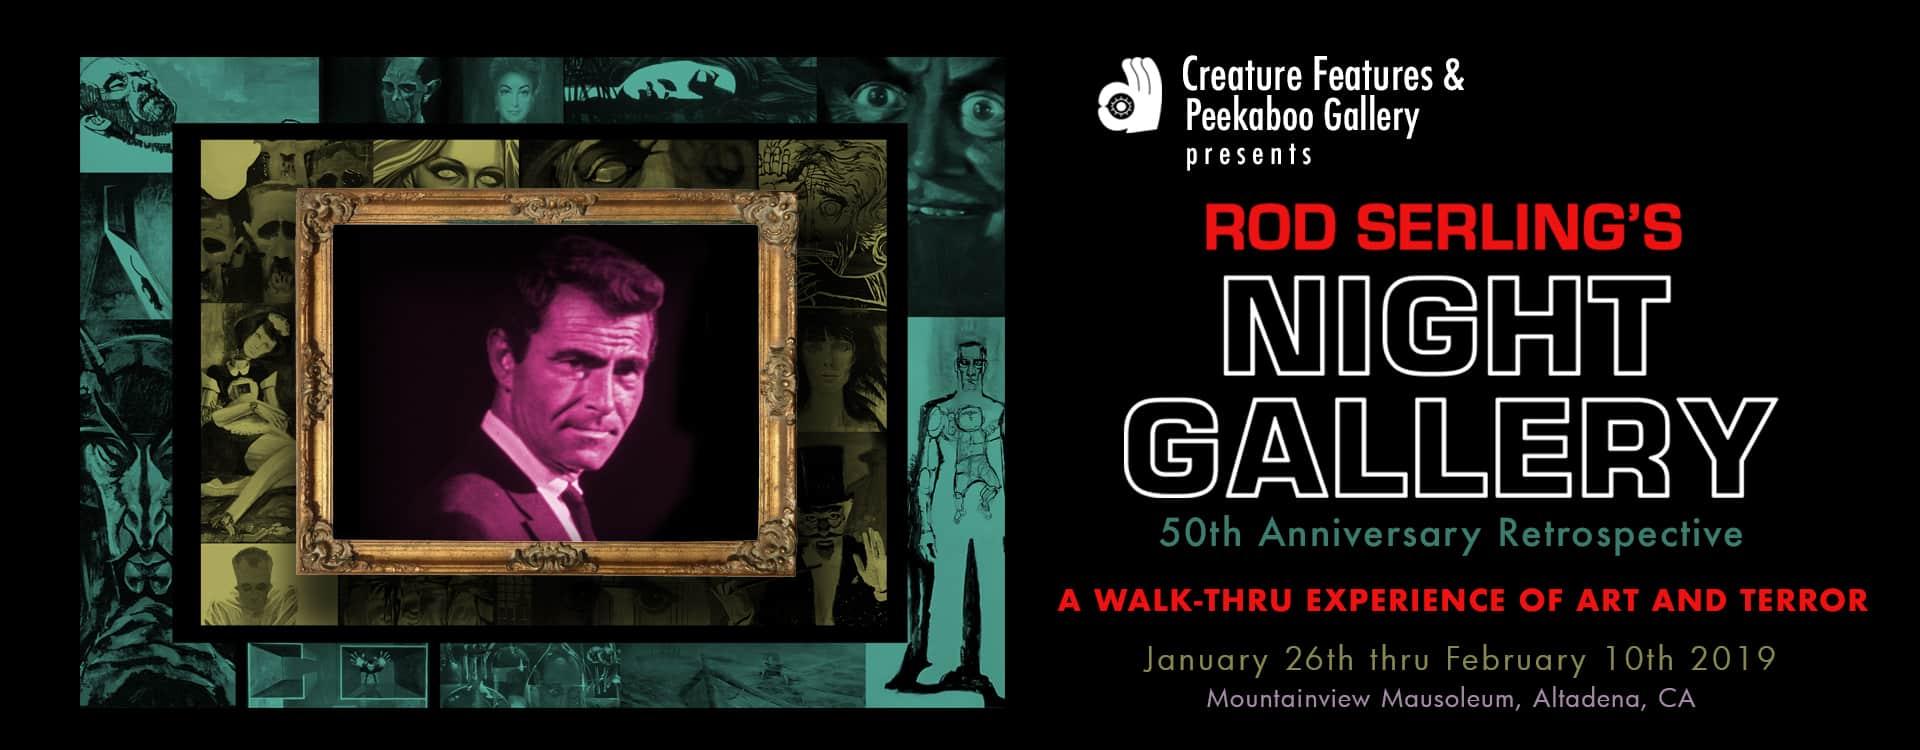 Rod Serling's NIGHT GALLERY invite